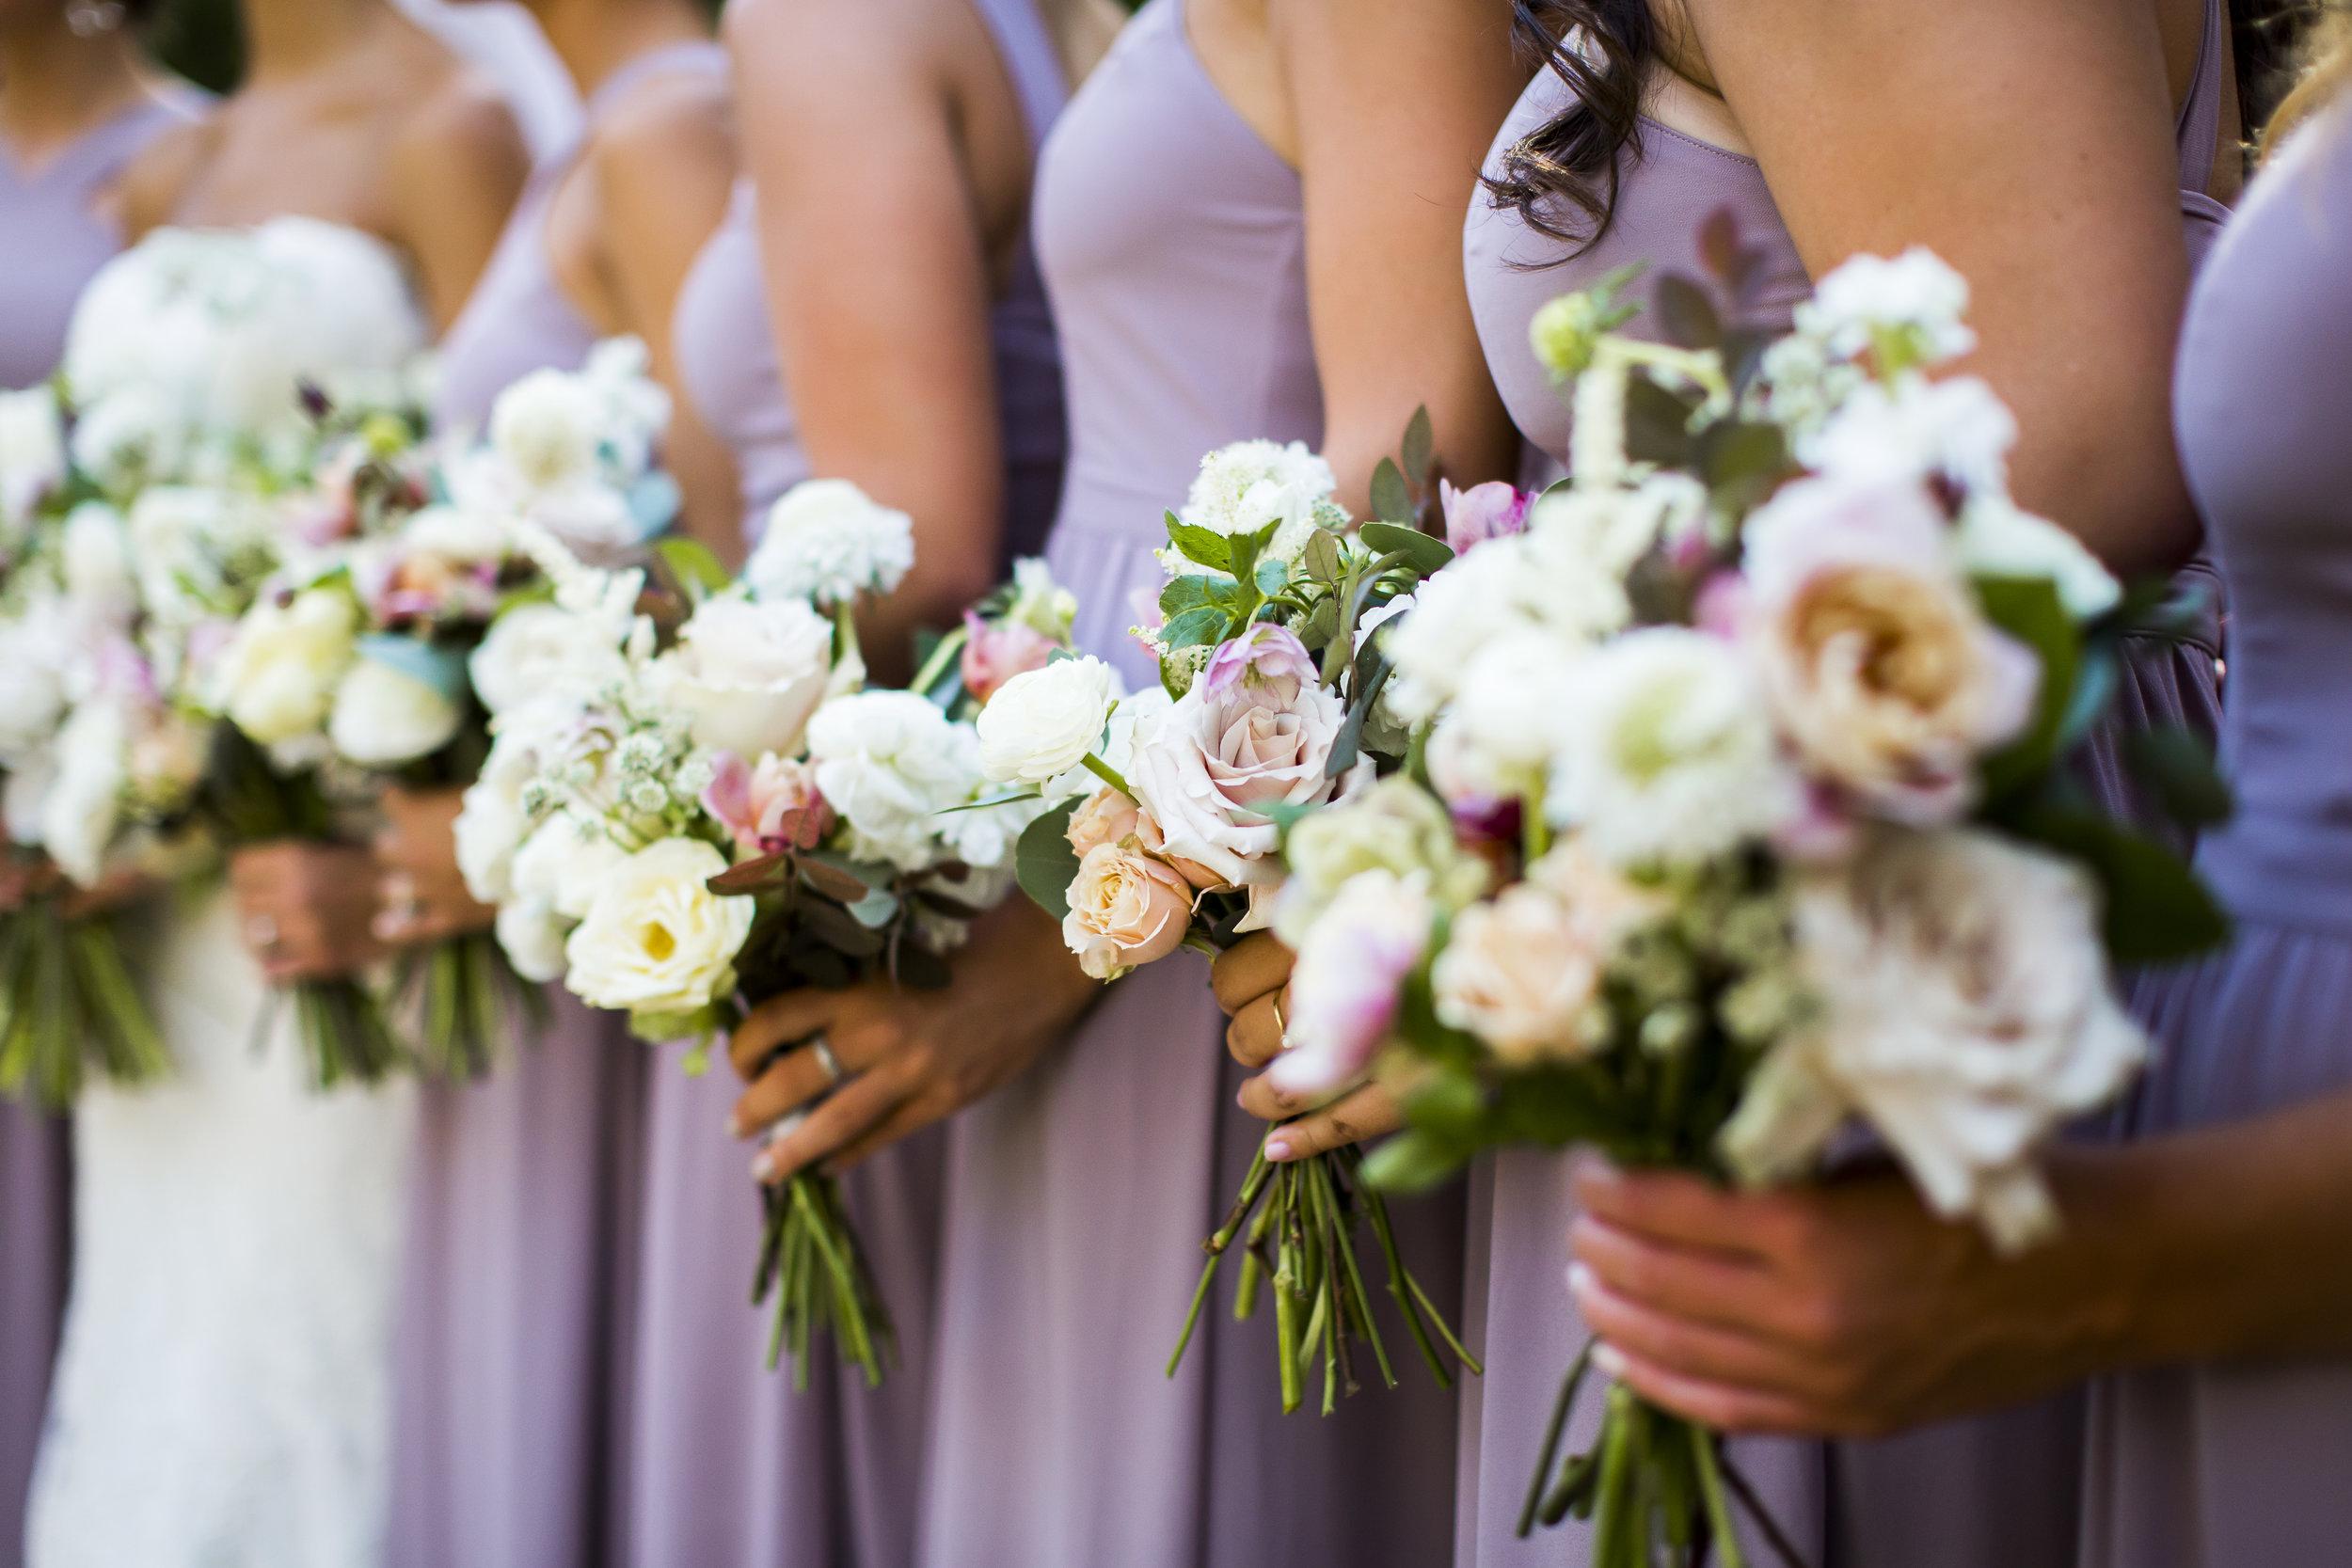 Perkins Wedding-138-(ZF-9700-01748-1-002).jpg